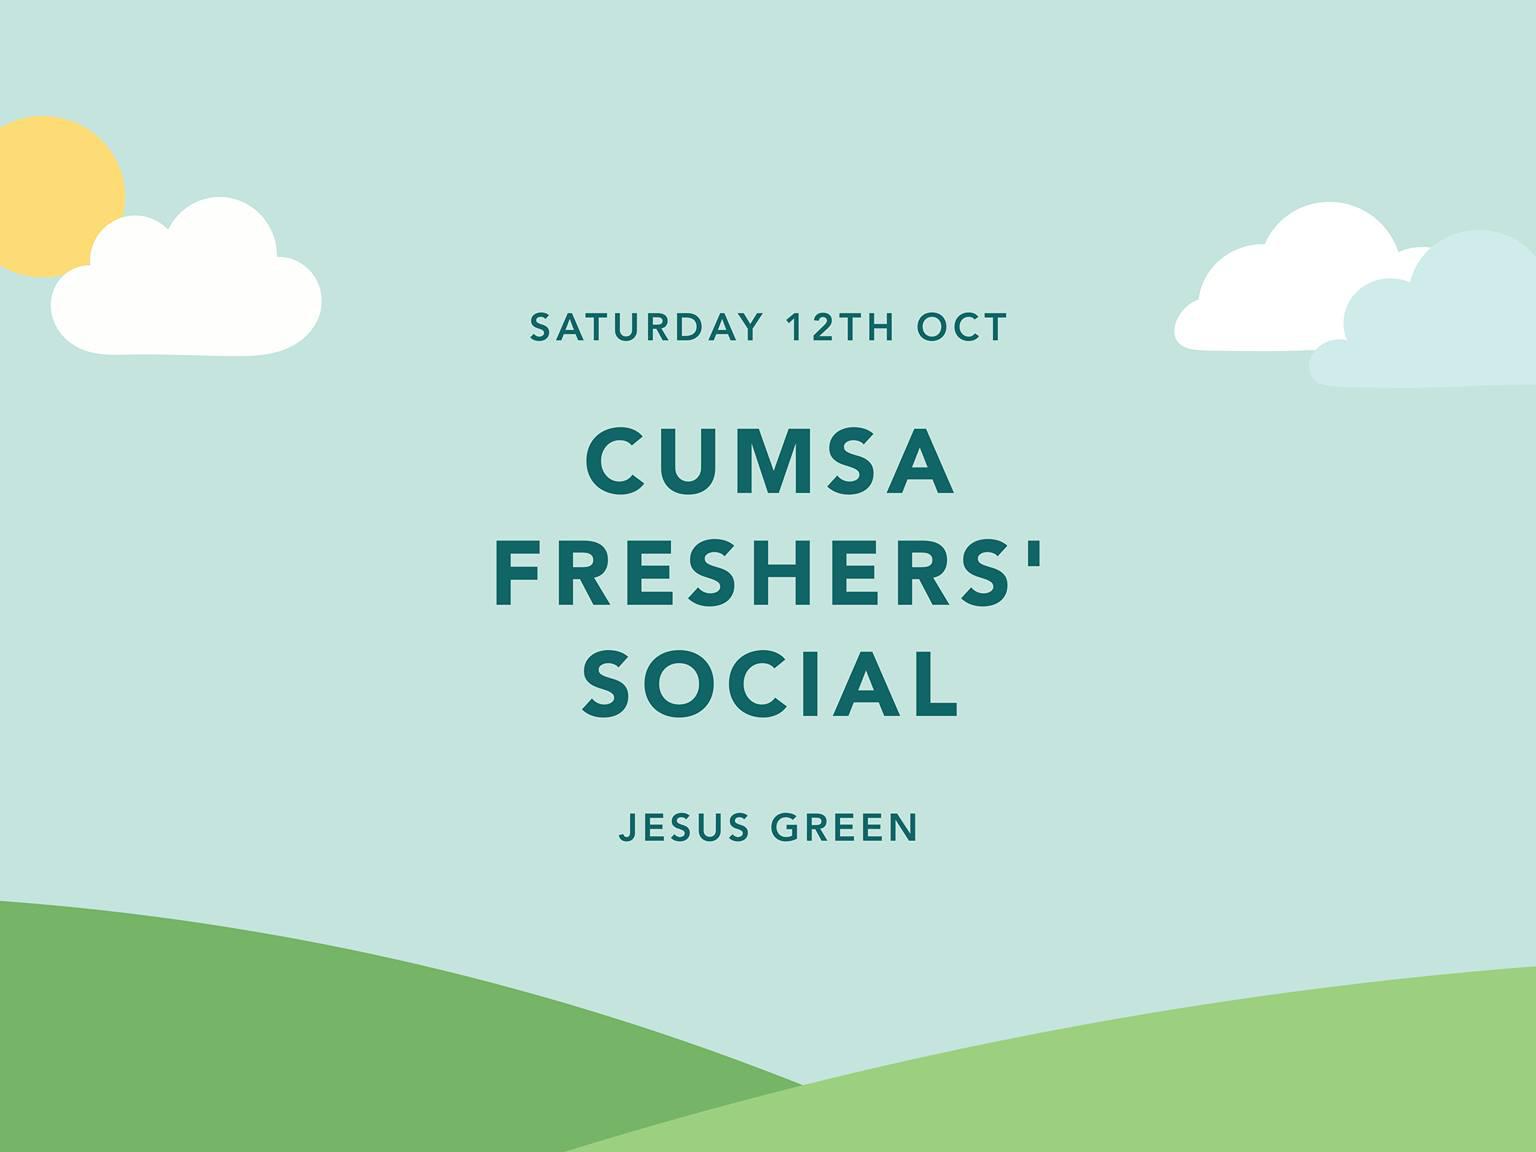 Freshers' Social